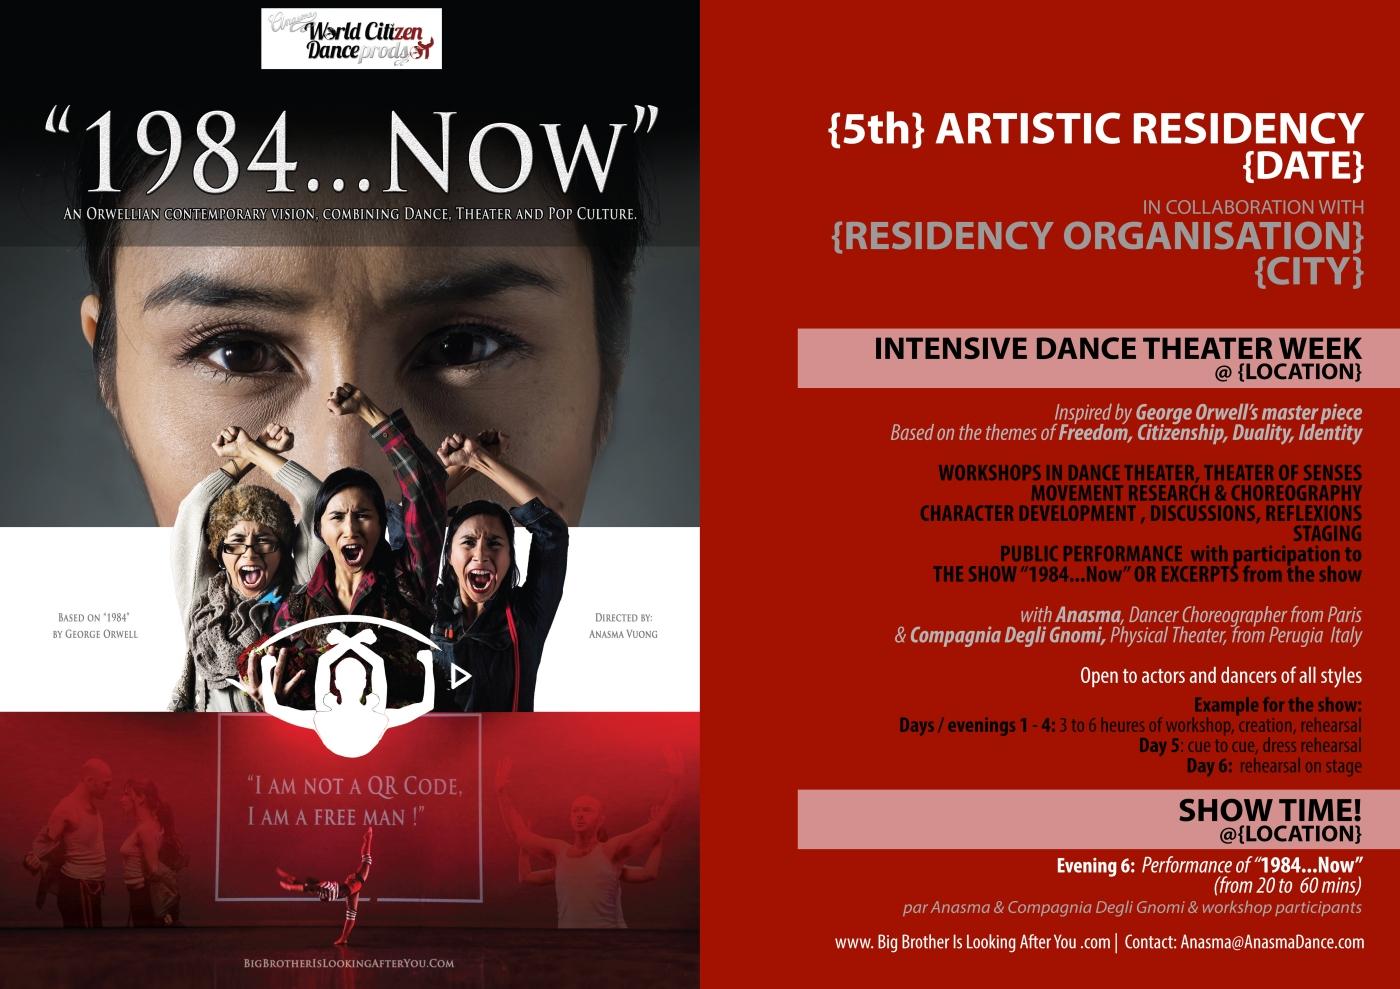 201610-flyer-residency-1984-now-2017-example